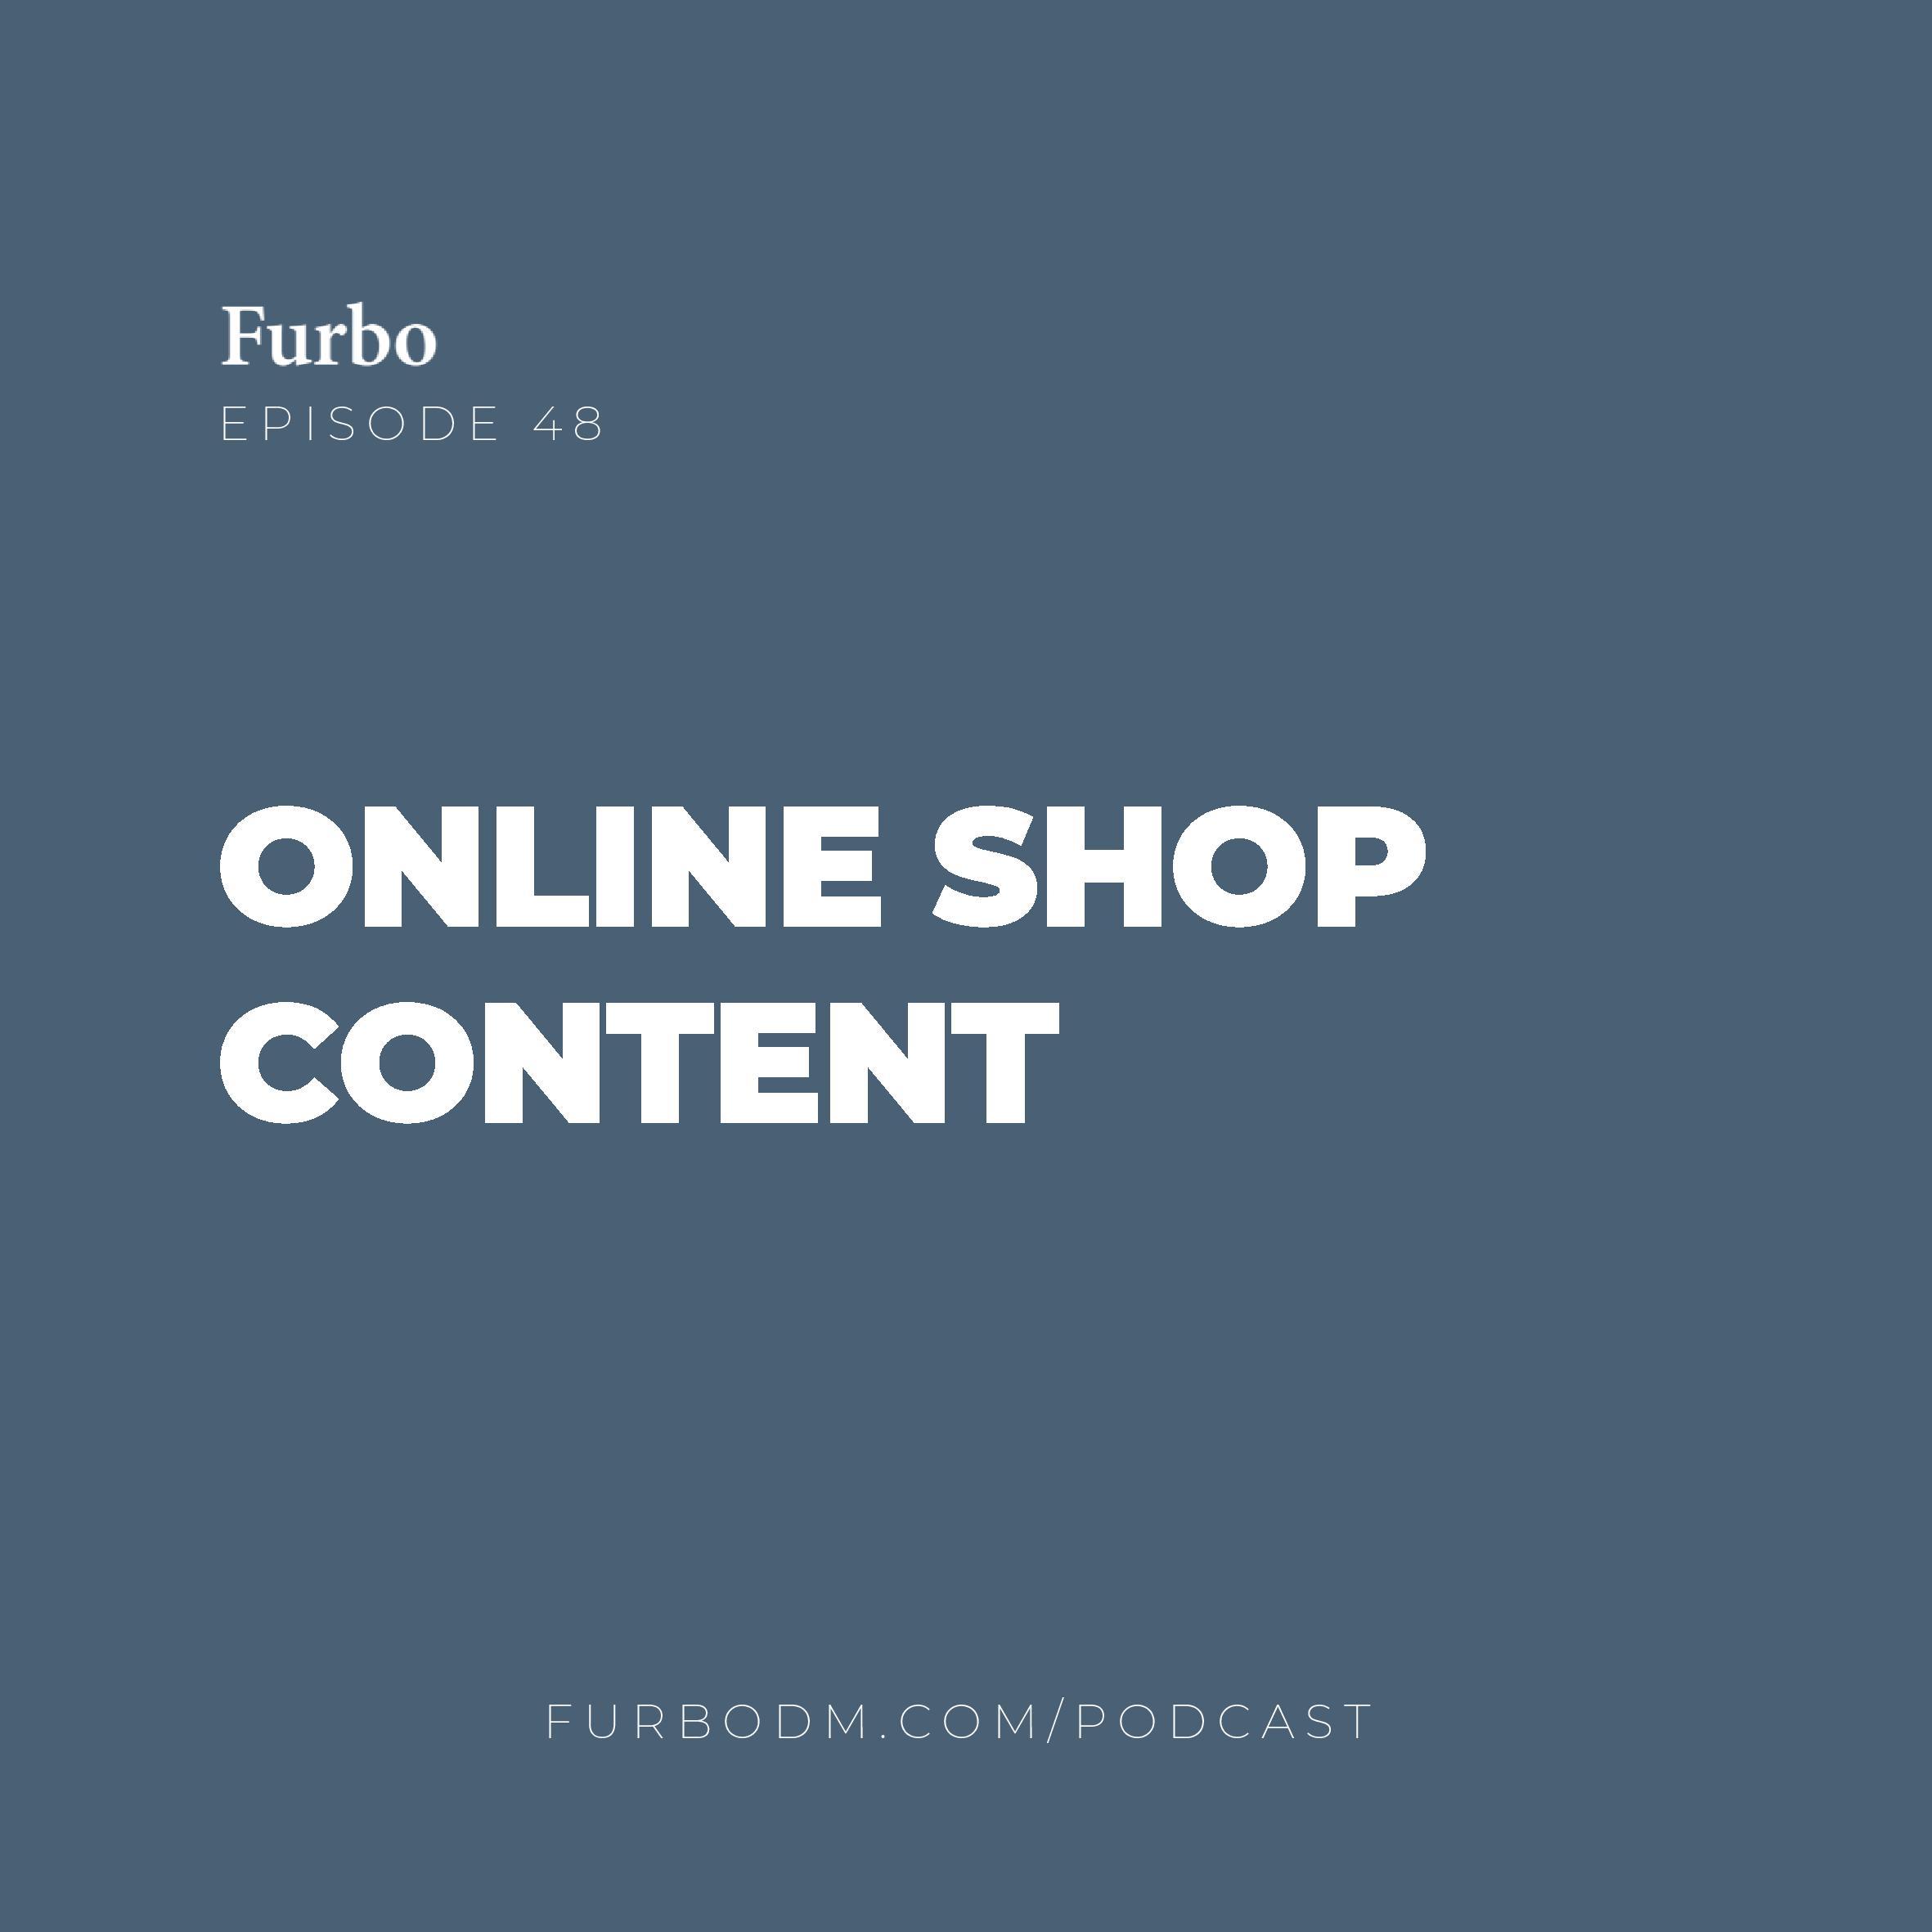 E48: Online Shop Content | تولید محتوا در فروشگاه اینترنتی چطور باید انجام شود؟